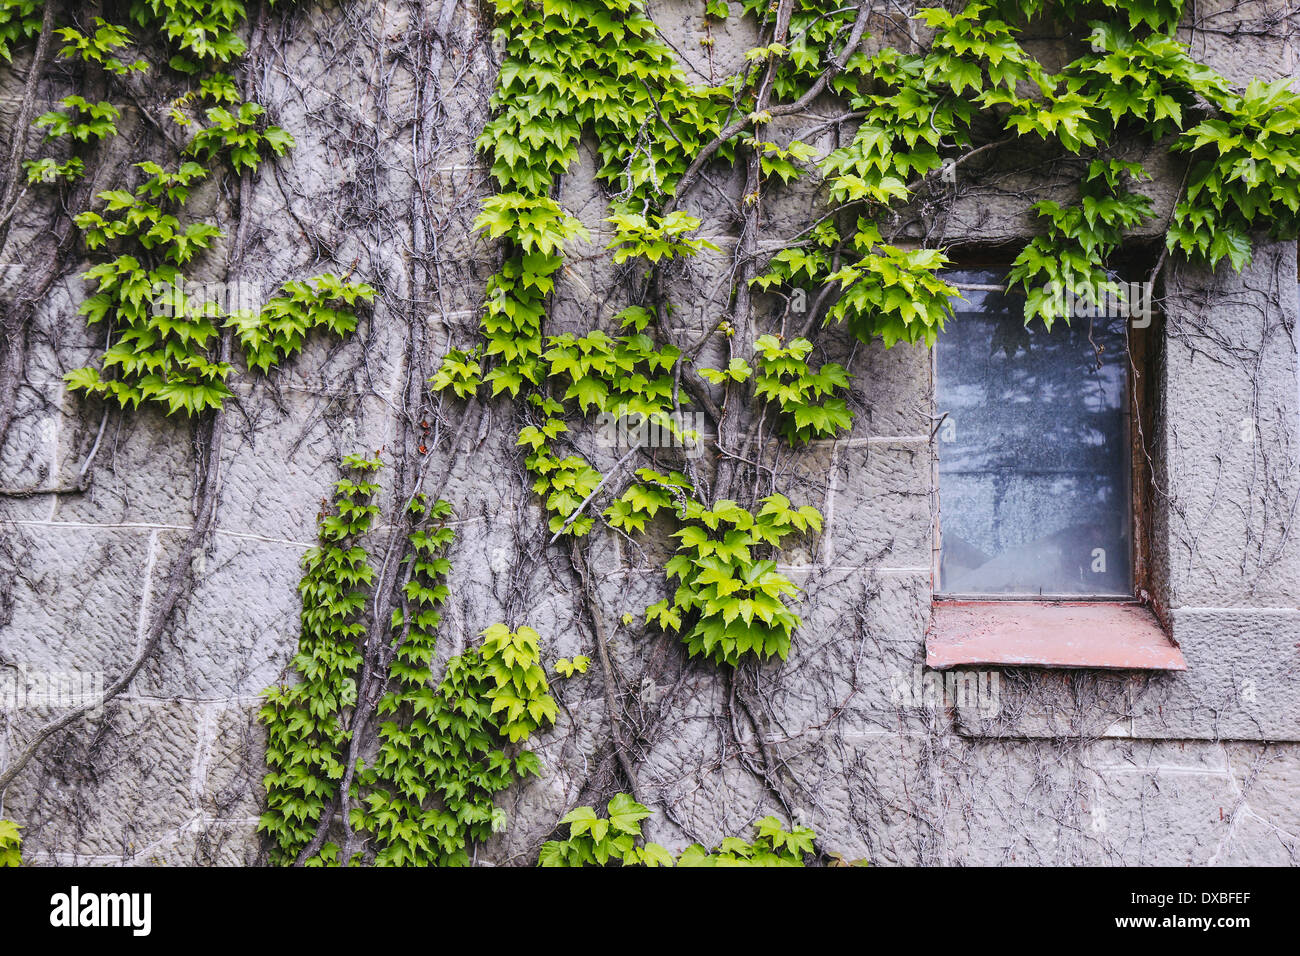 Altes Schloss Mit Efeu An Der Wand Stockfoto, Bild